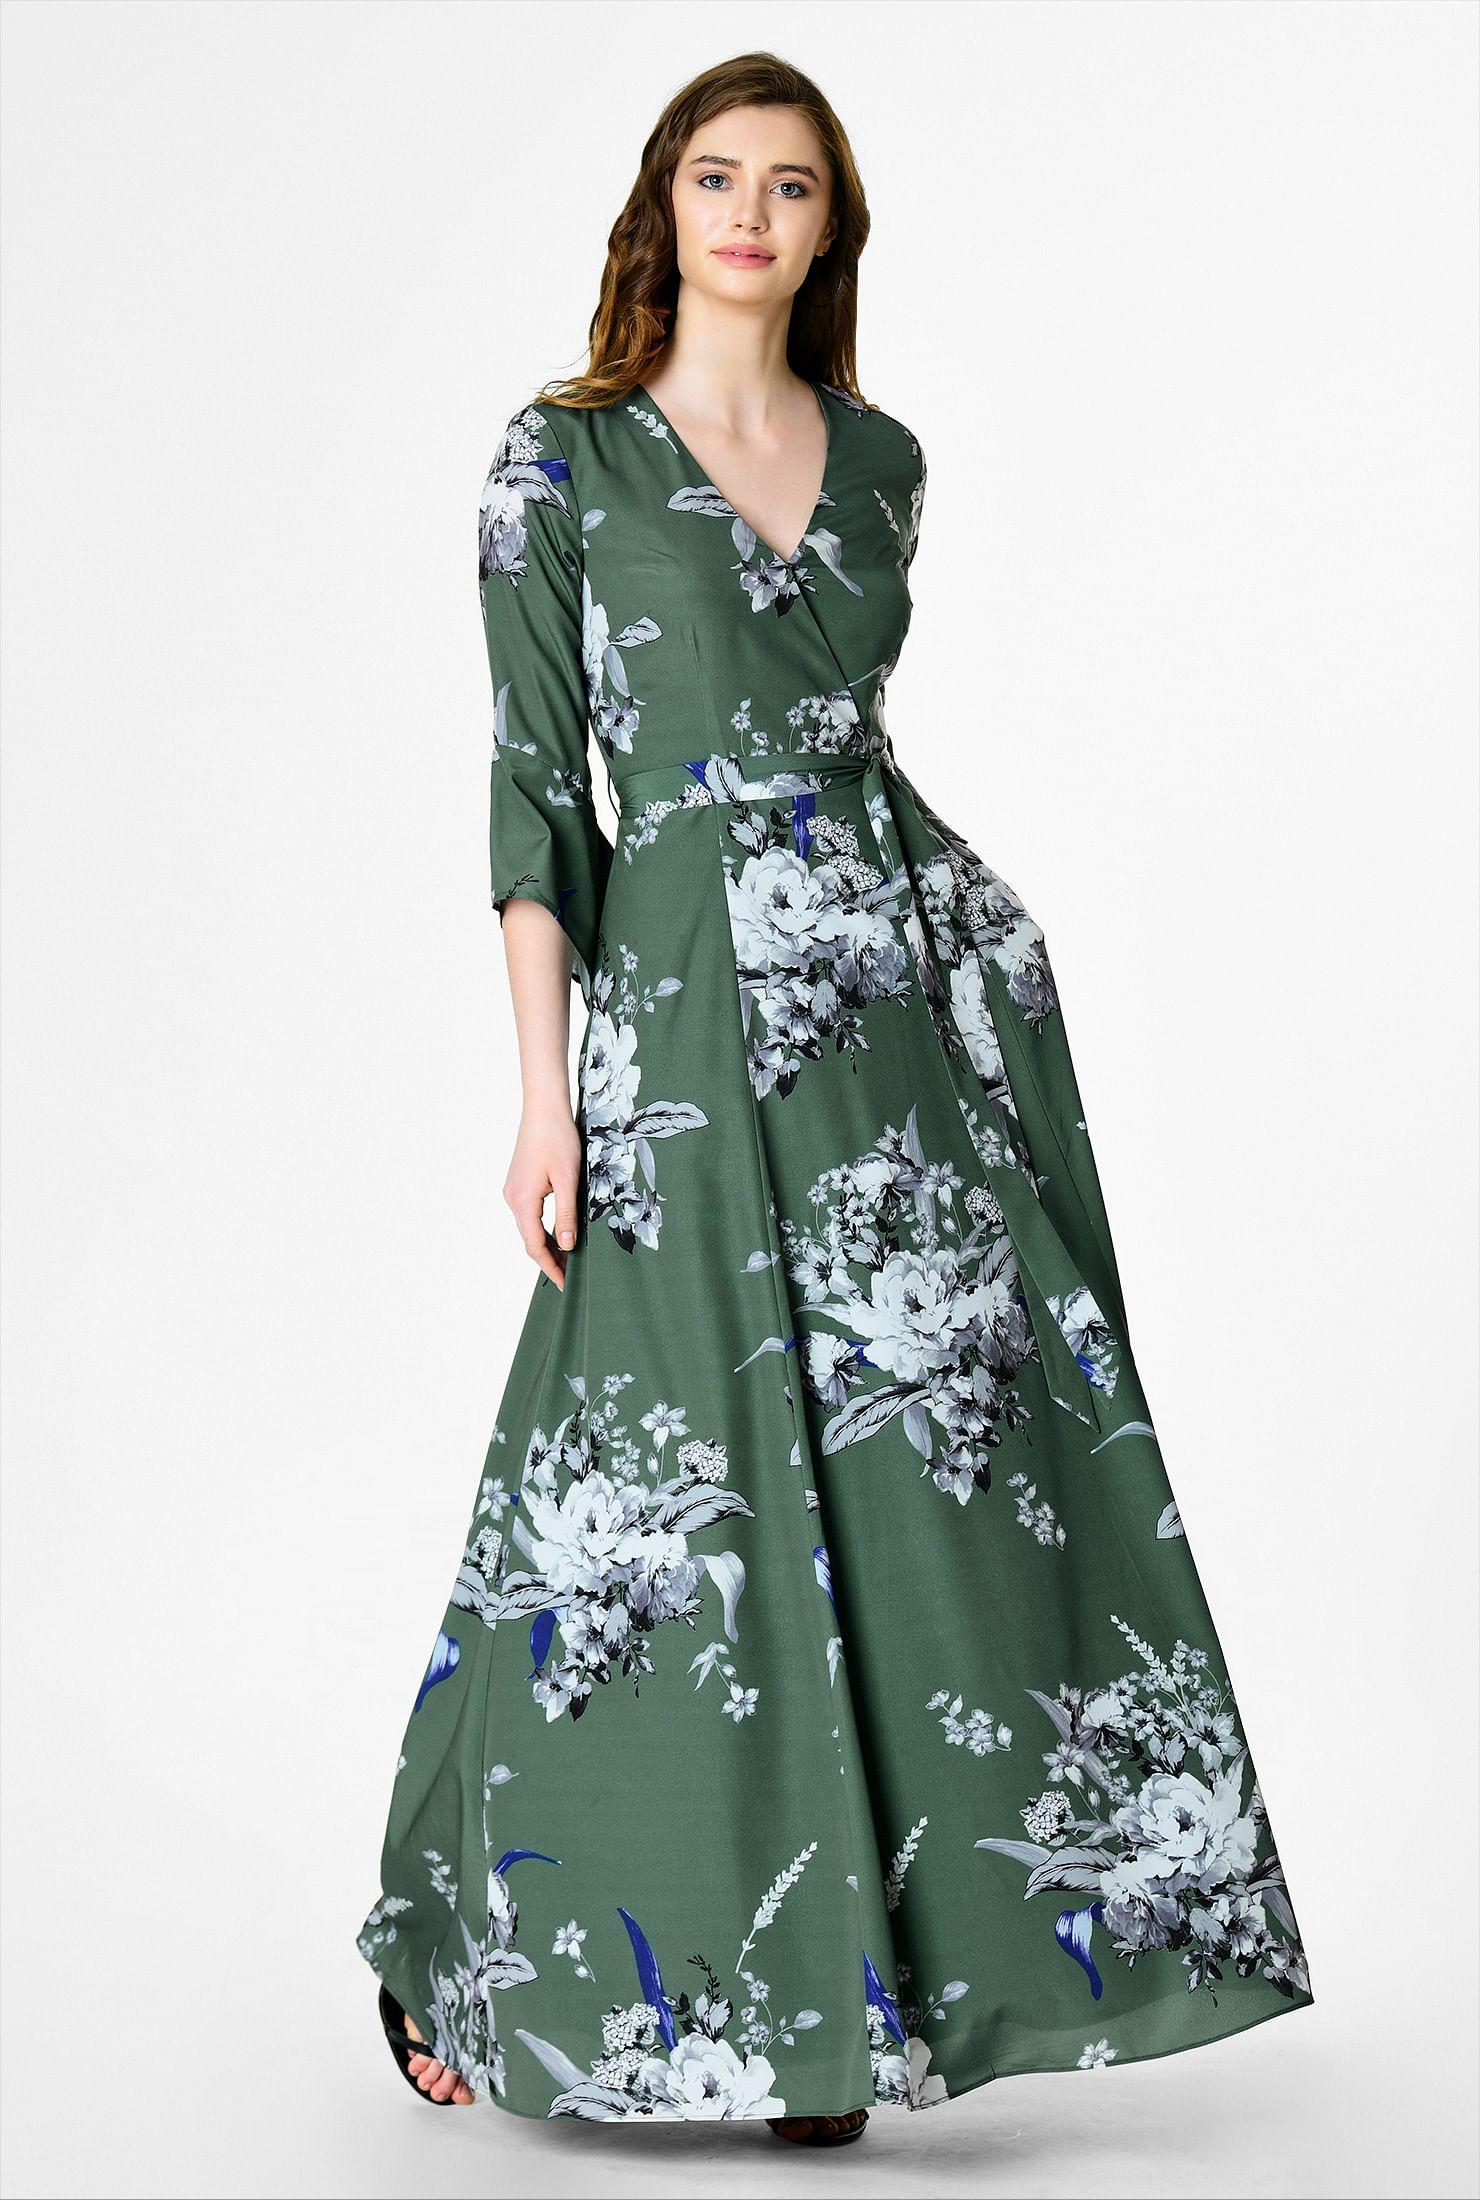 df5363834b62 ... Floral print crepe surplice maxi dress. Out of Stock. , Bracelet length  dresses, digital print dresses, Dusty Green dresses, full length with